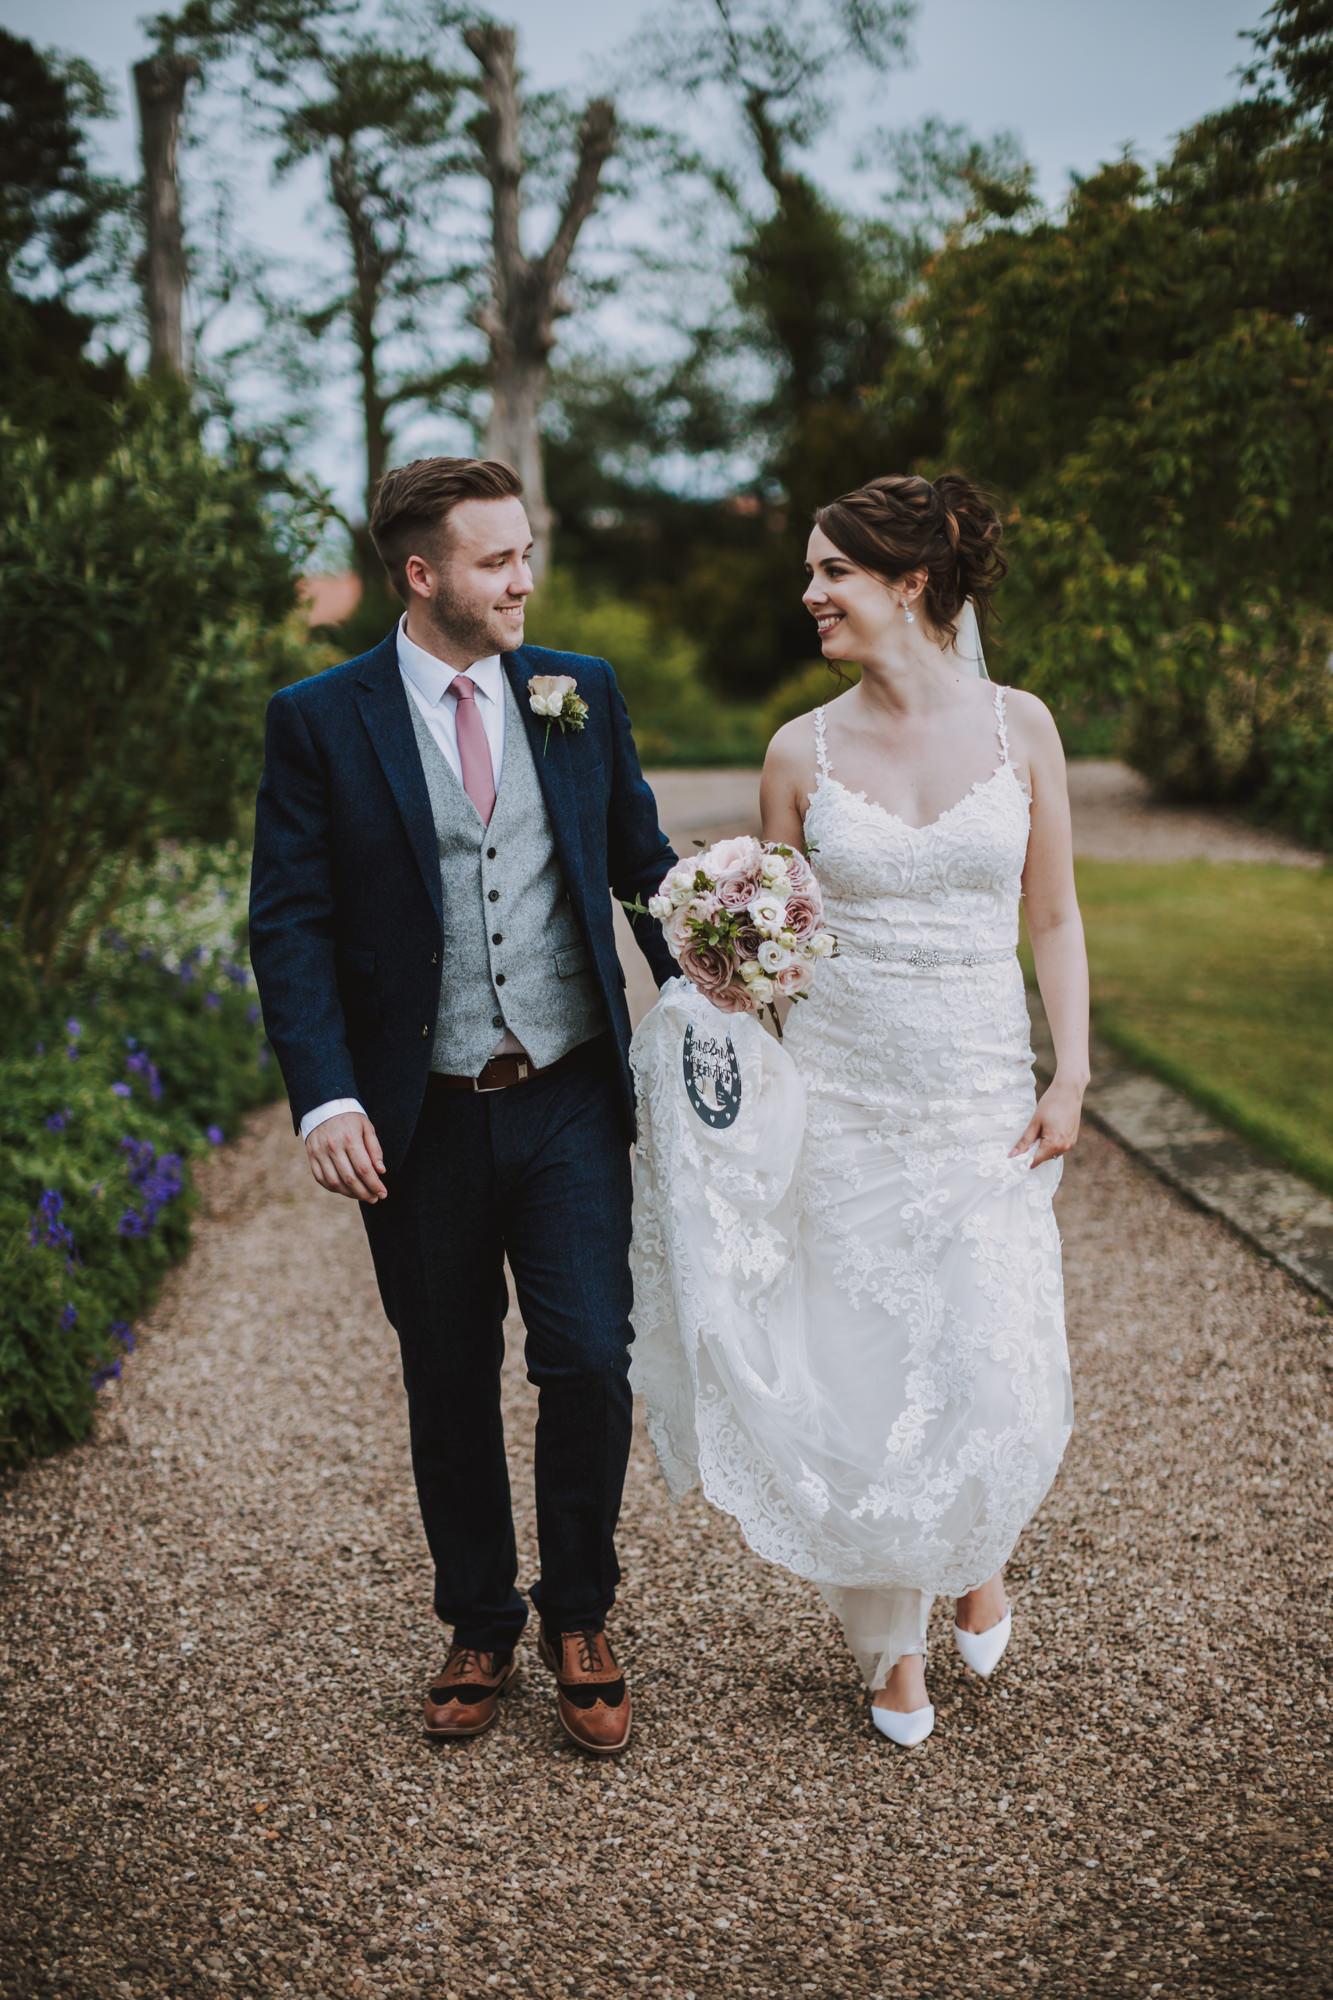 hodsock priory wedding photographers blog66.jpg